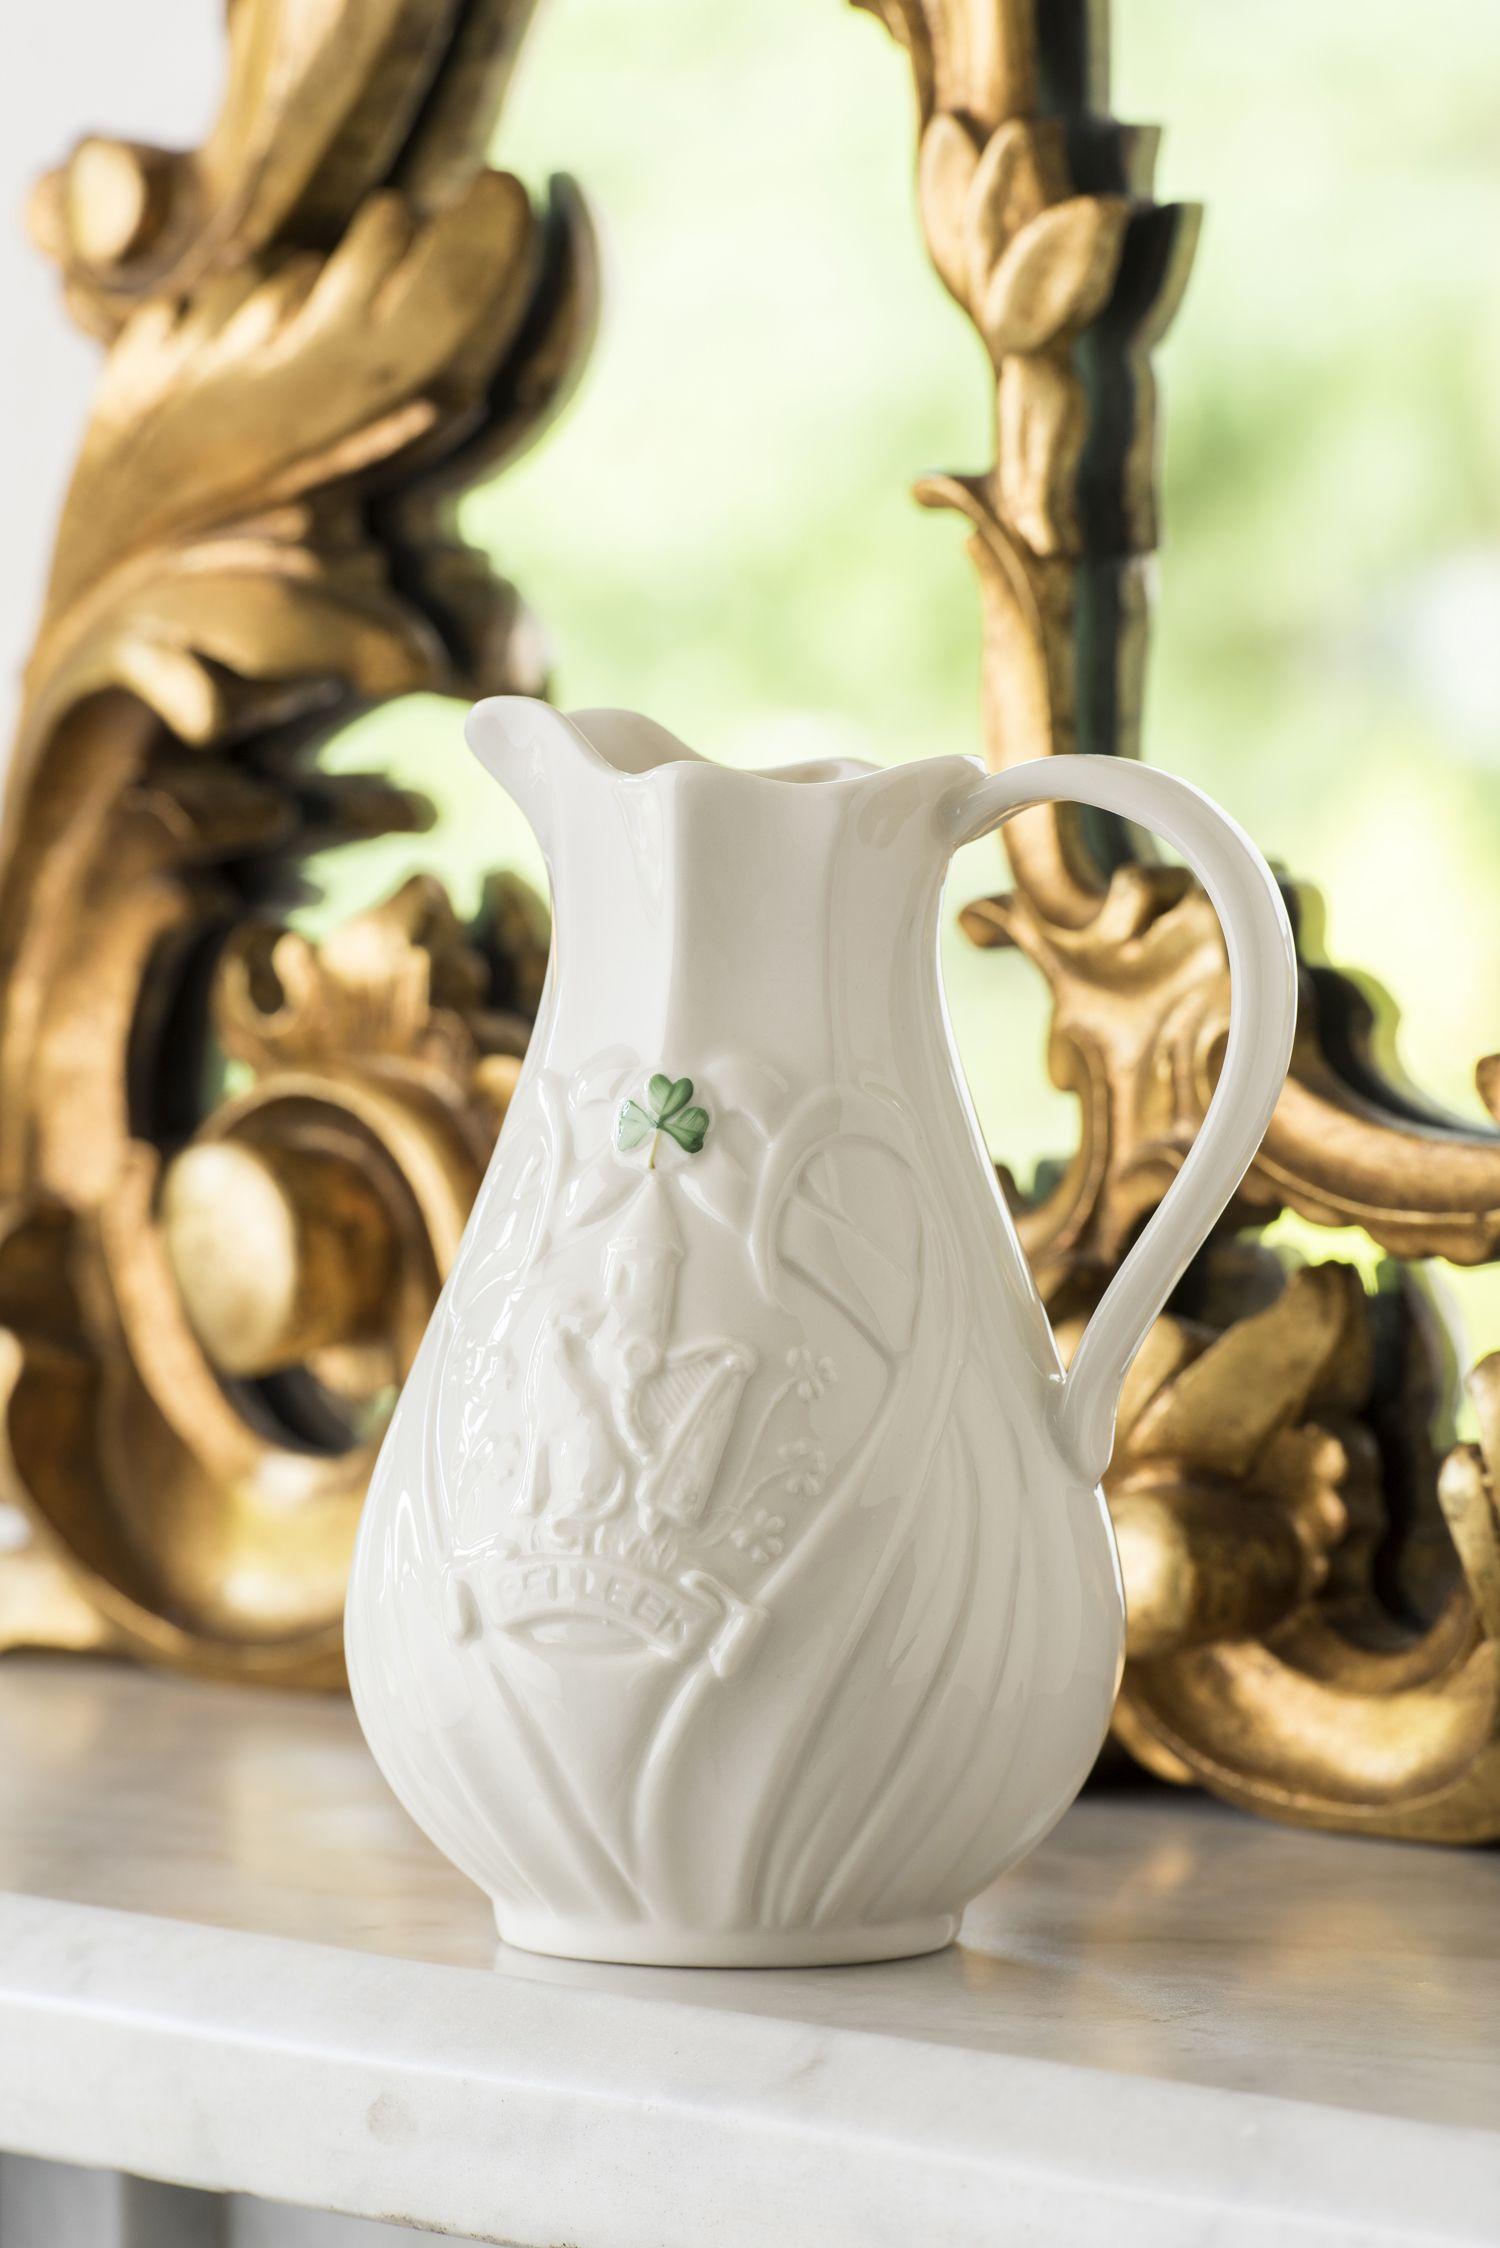 Pin By Kari Jaure On House Decor Ideas Irish Gifts Belleek Pottery Pottery Gifts